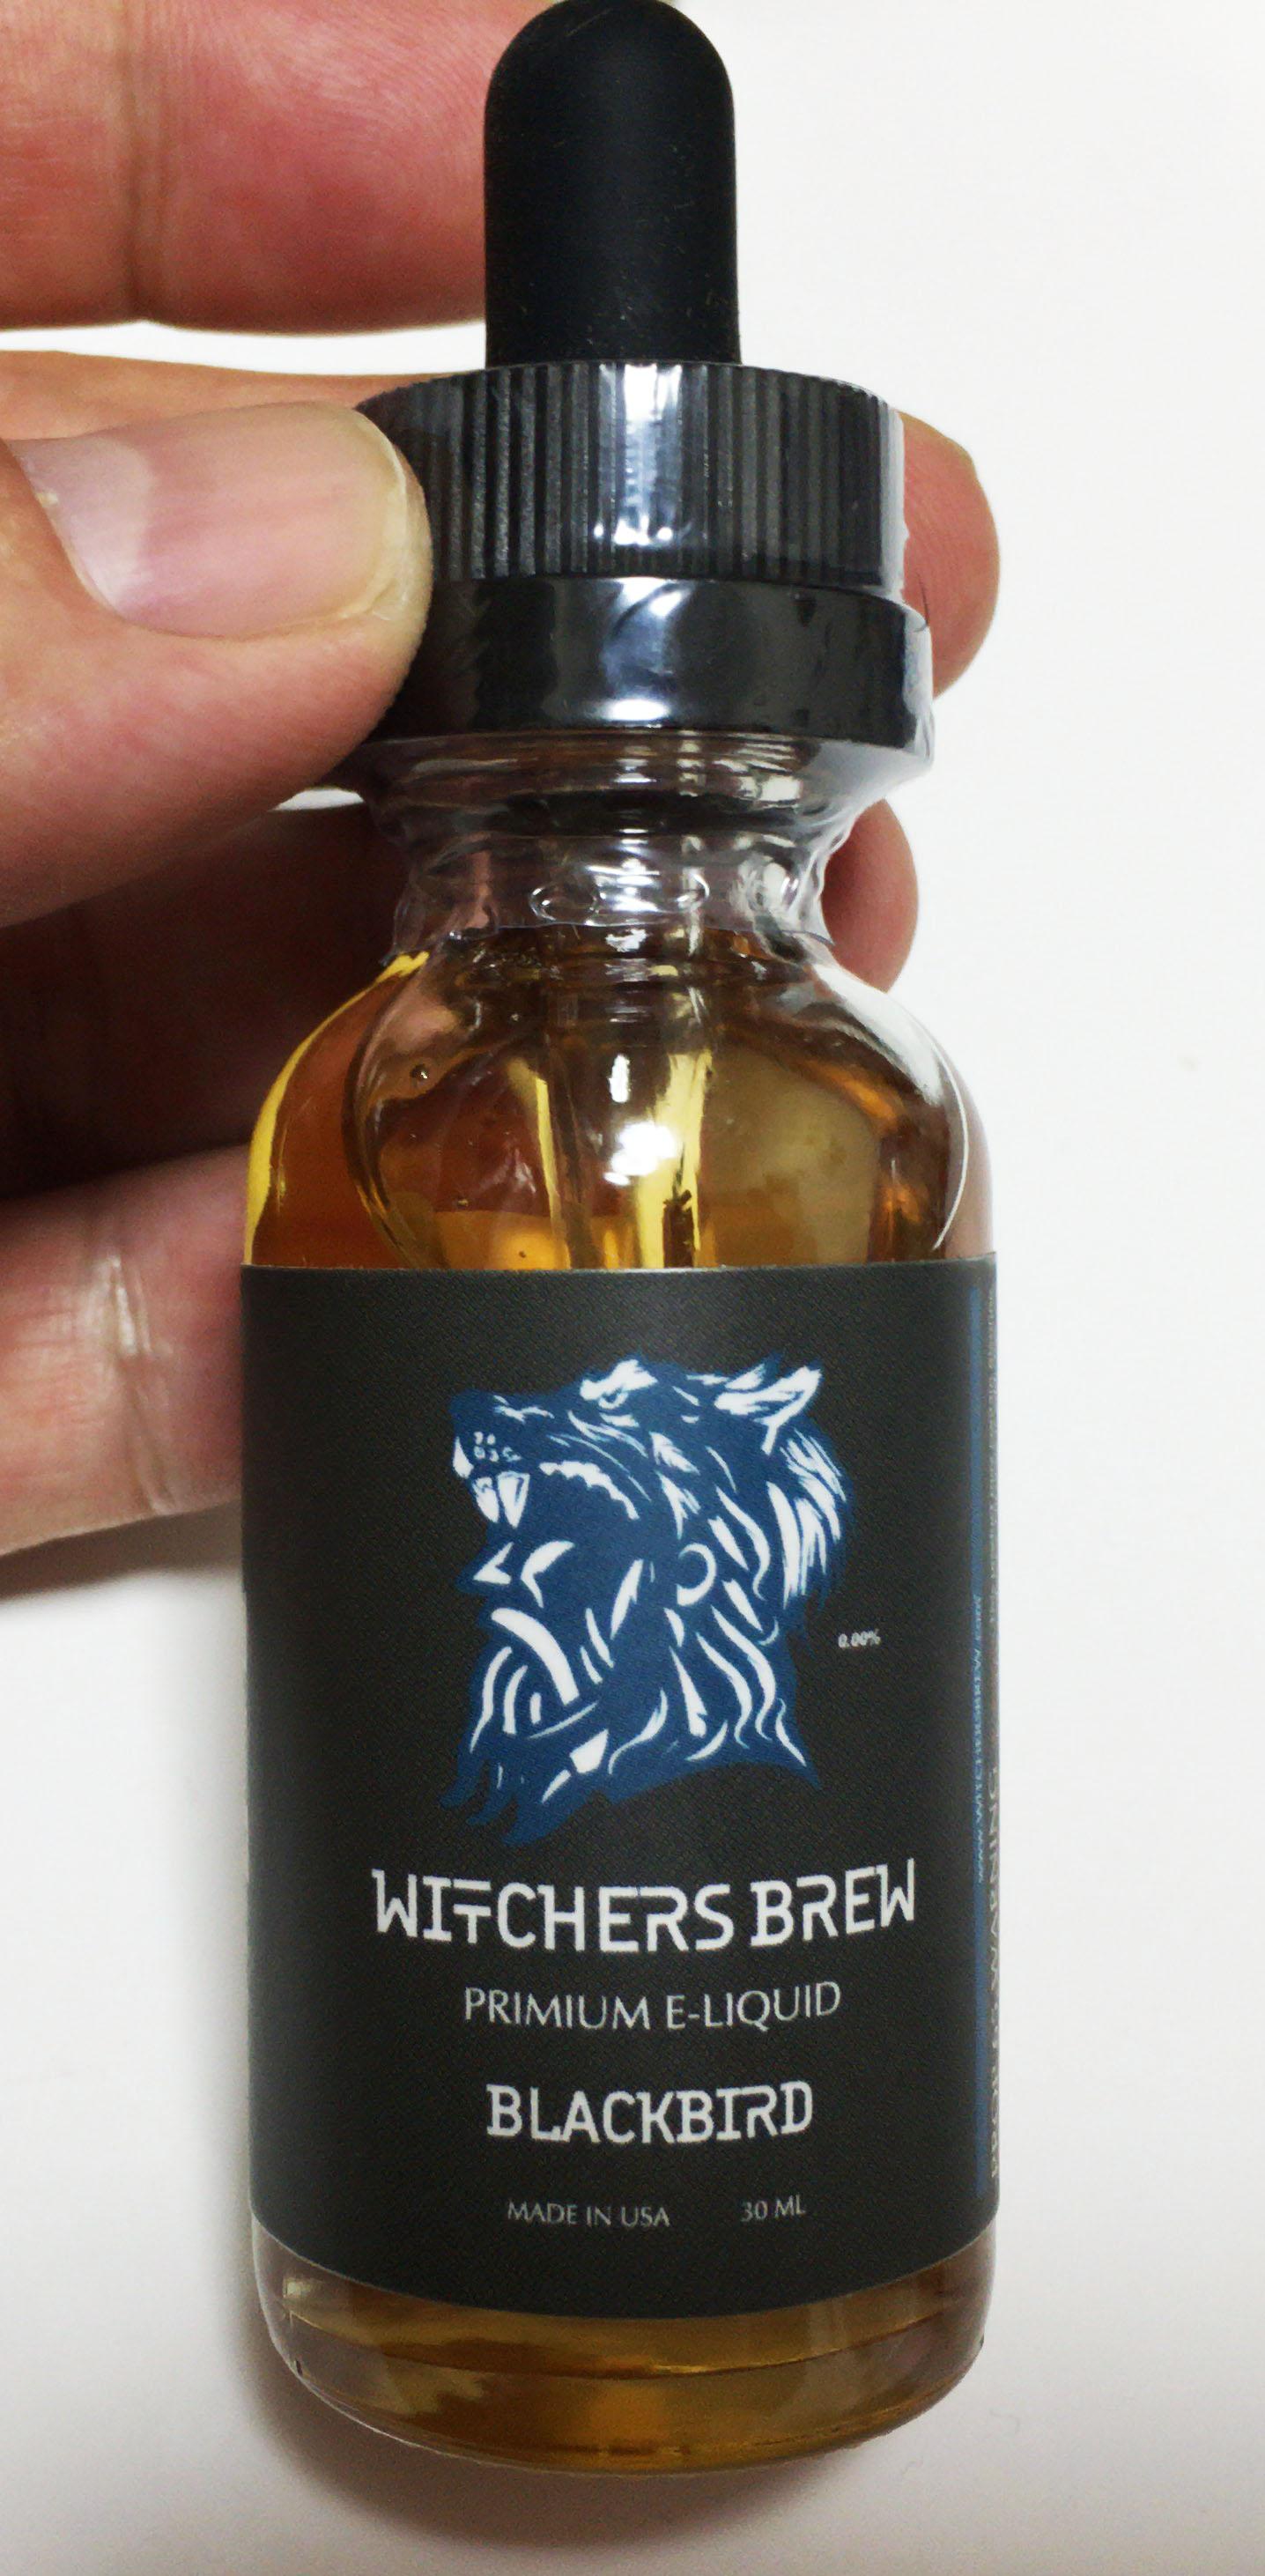 Witchers Brew Blackbird – 上品なオトナ味の洋酒タバコ